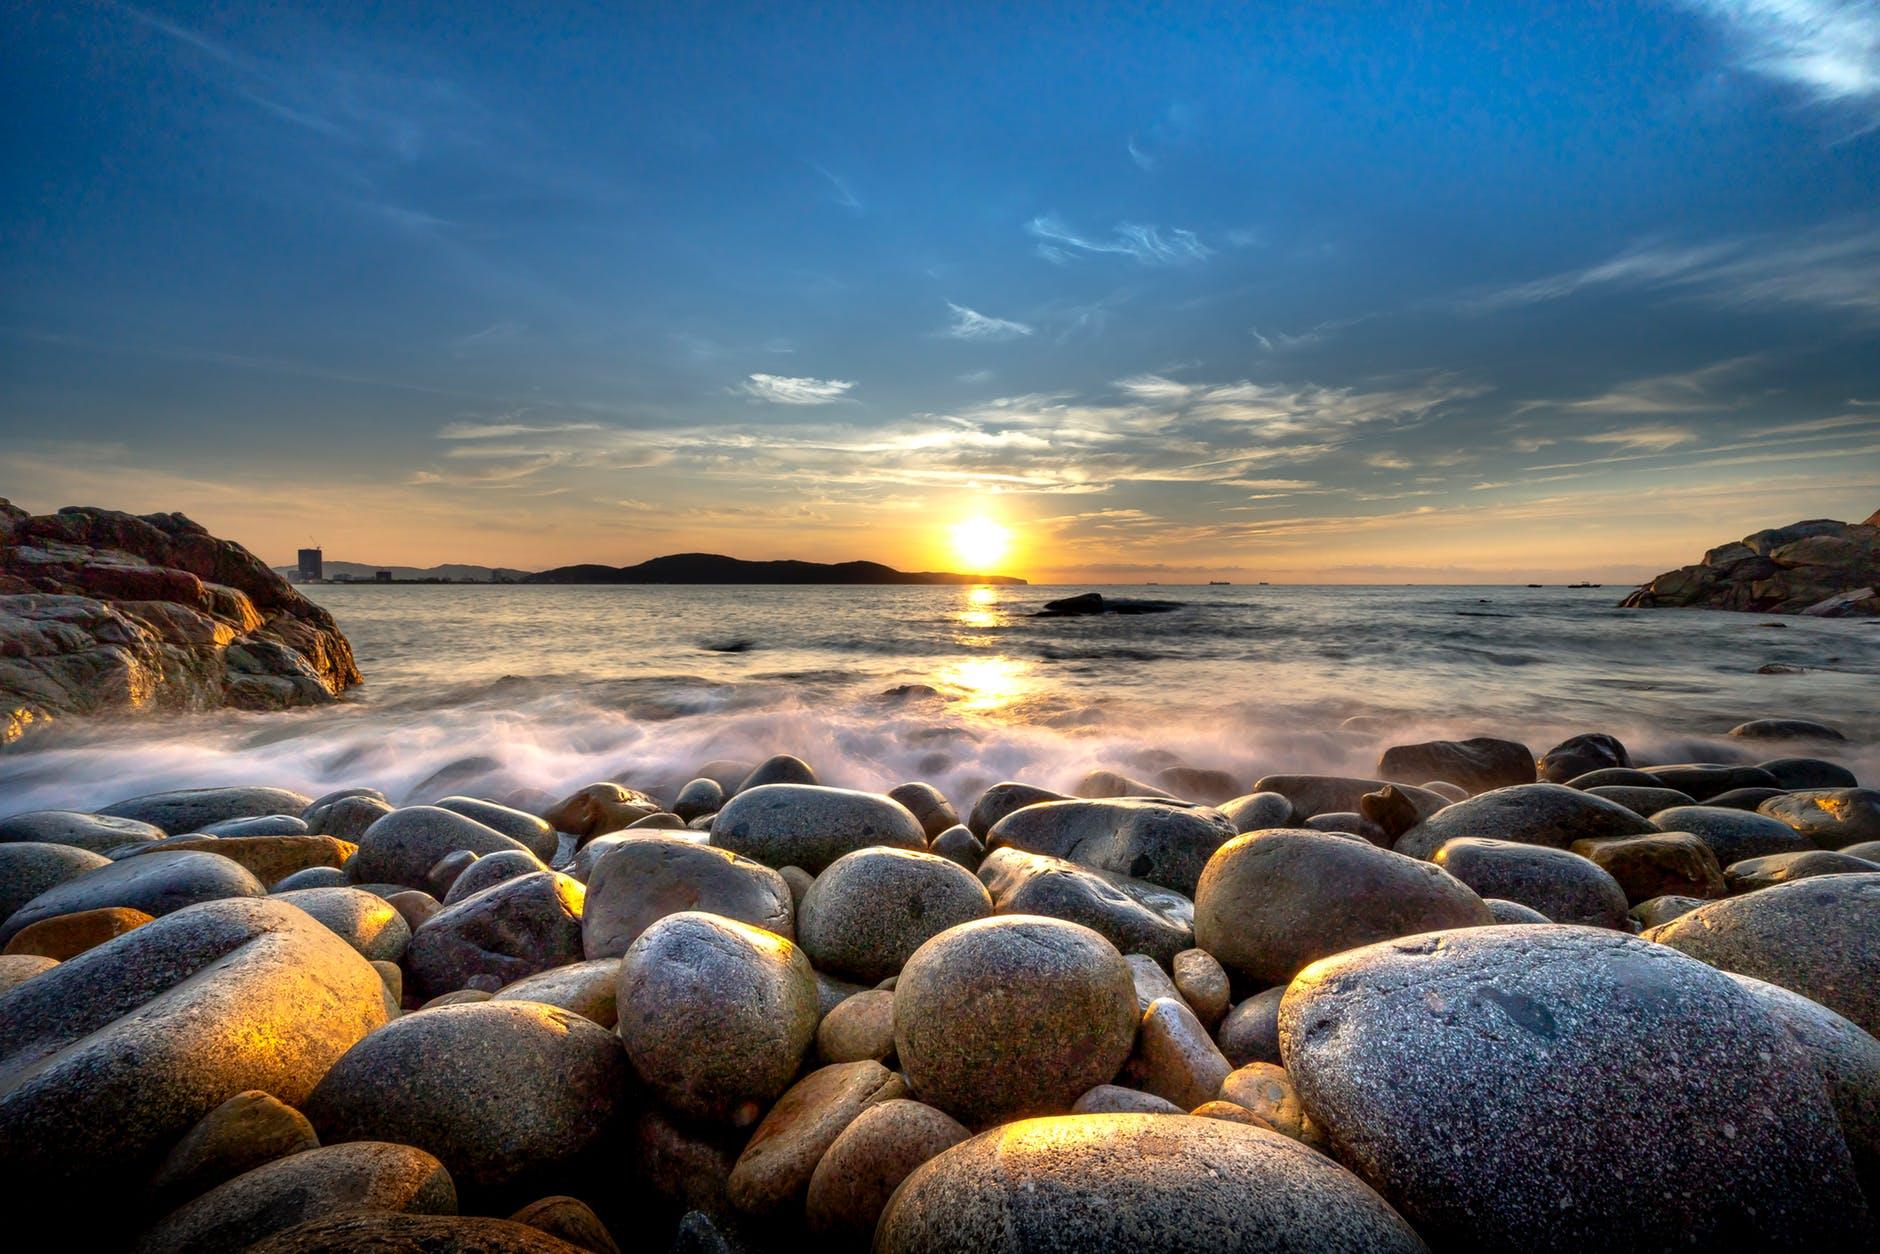 Photo by Quang Nguyen Vinh on Pexels.com